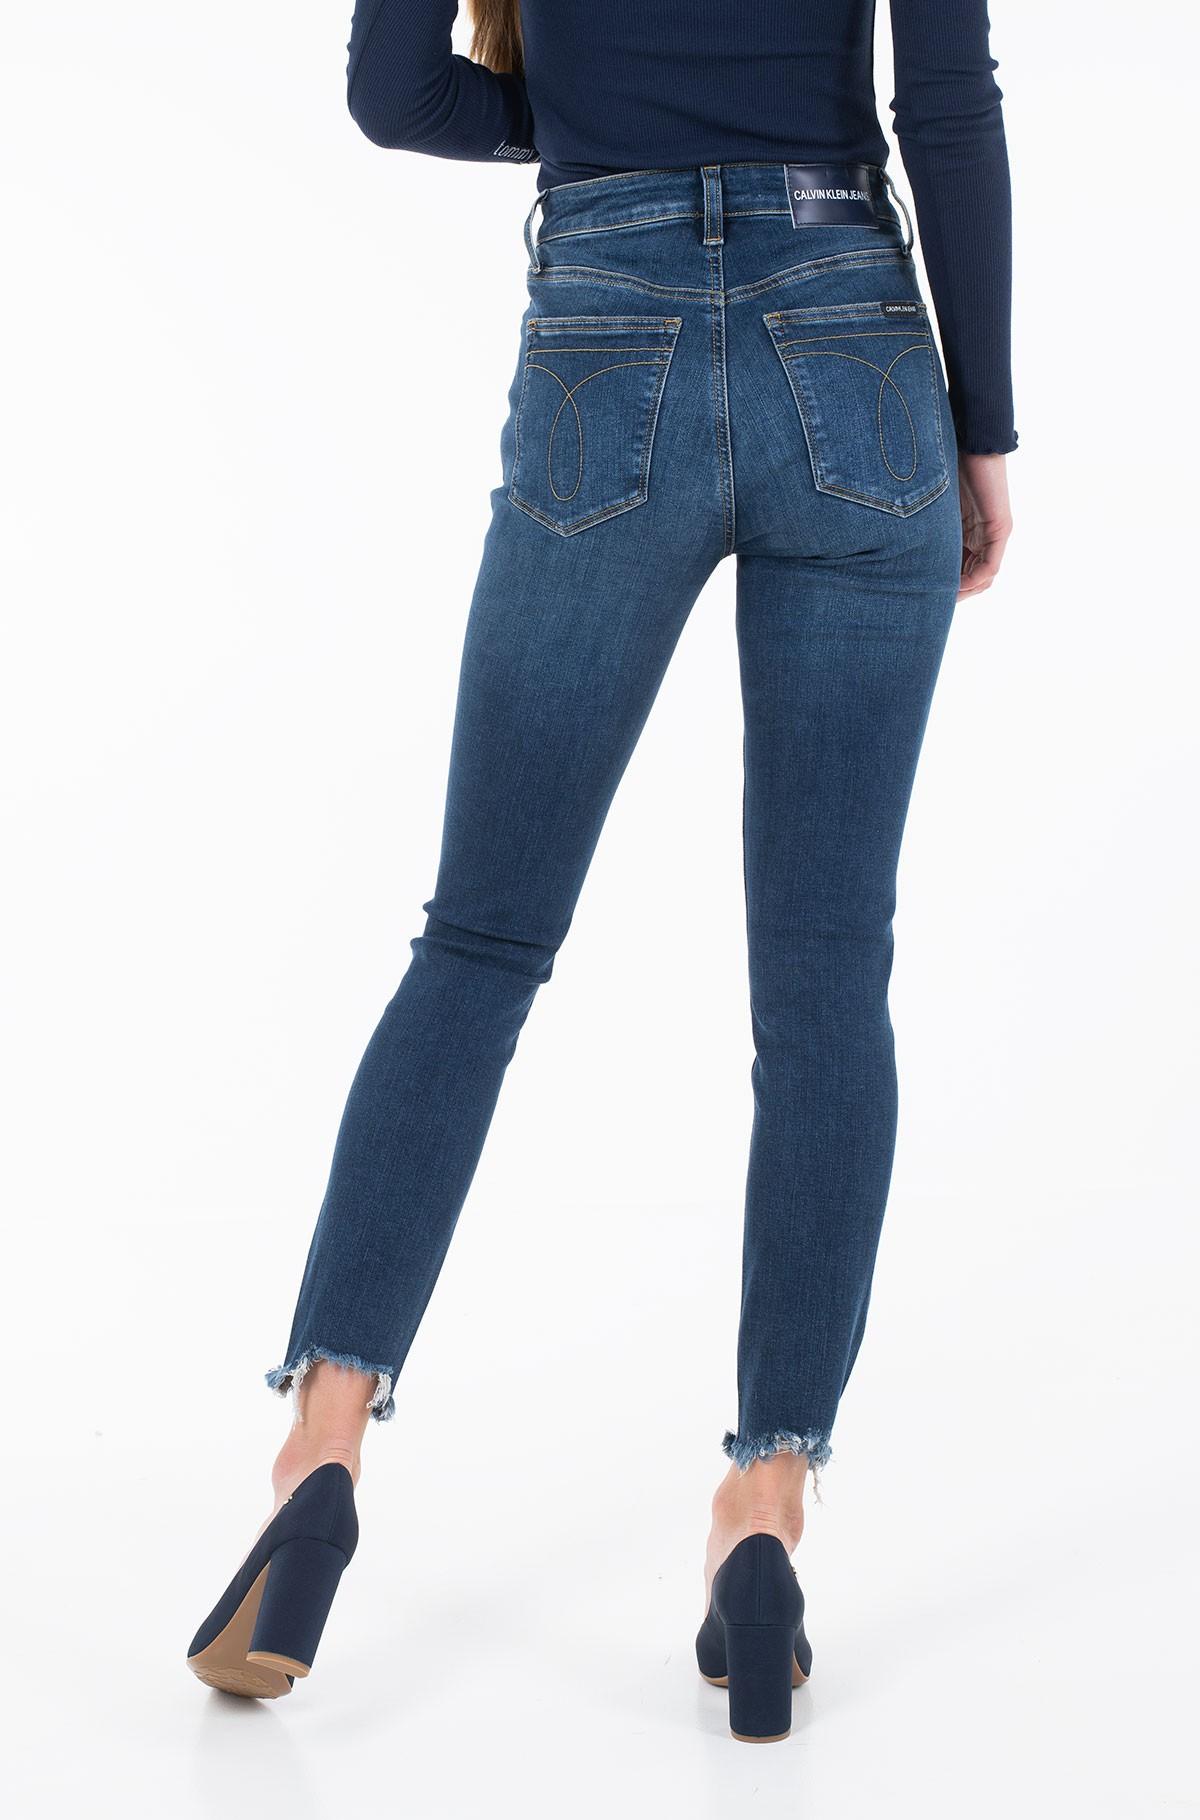 Jeans CKJ 010 HIGH RISE SKINNY ANKLE J20J211895-full-2